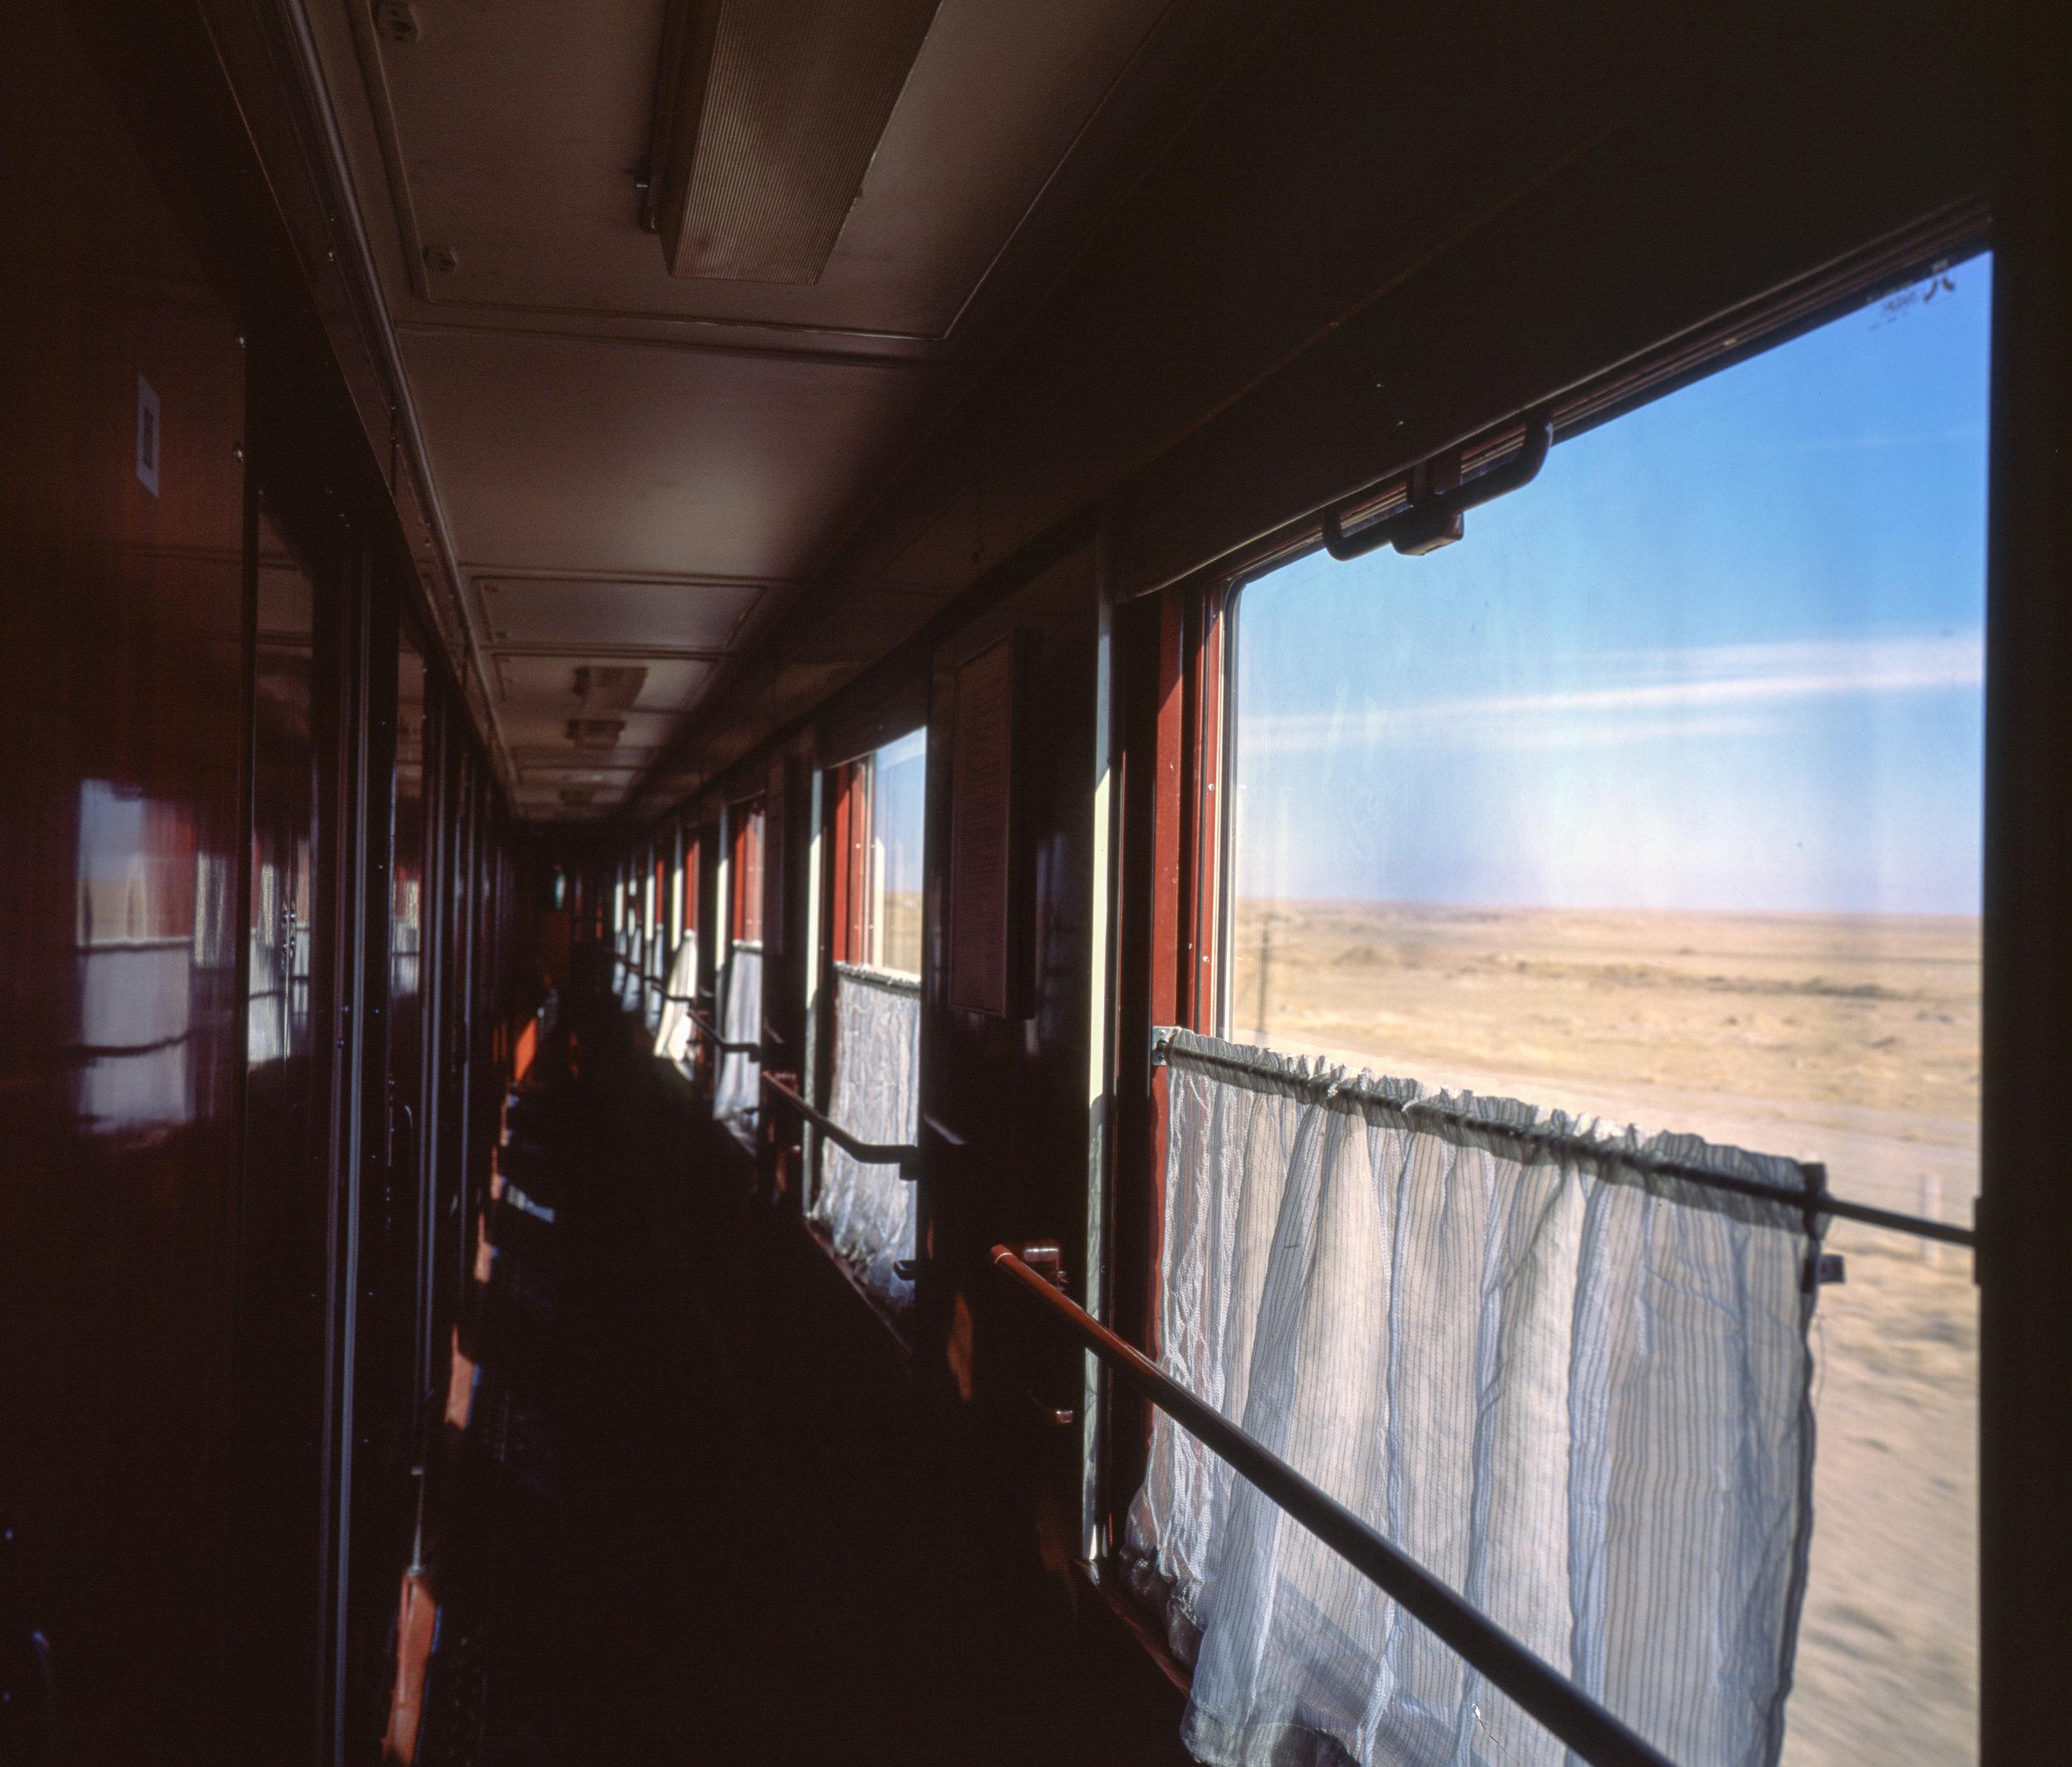 Riding the rails through the Gobi Desert Fuji Gf670w   Fuji Provia 100f